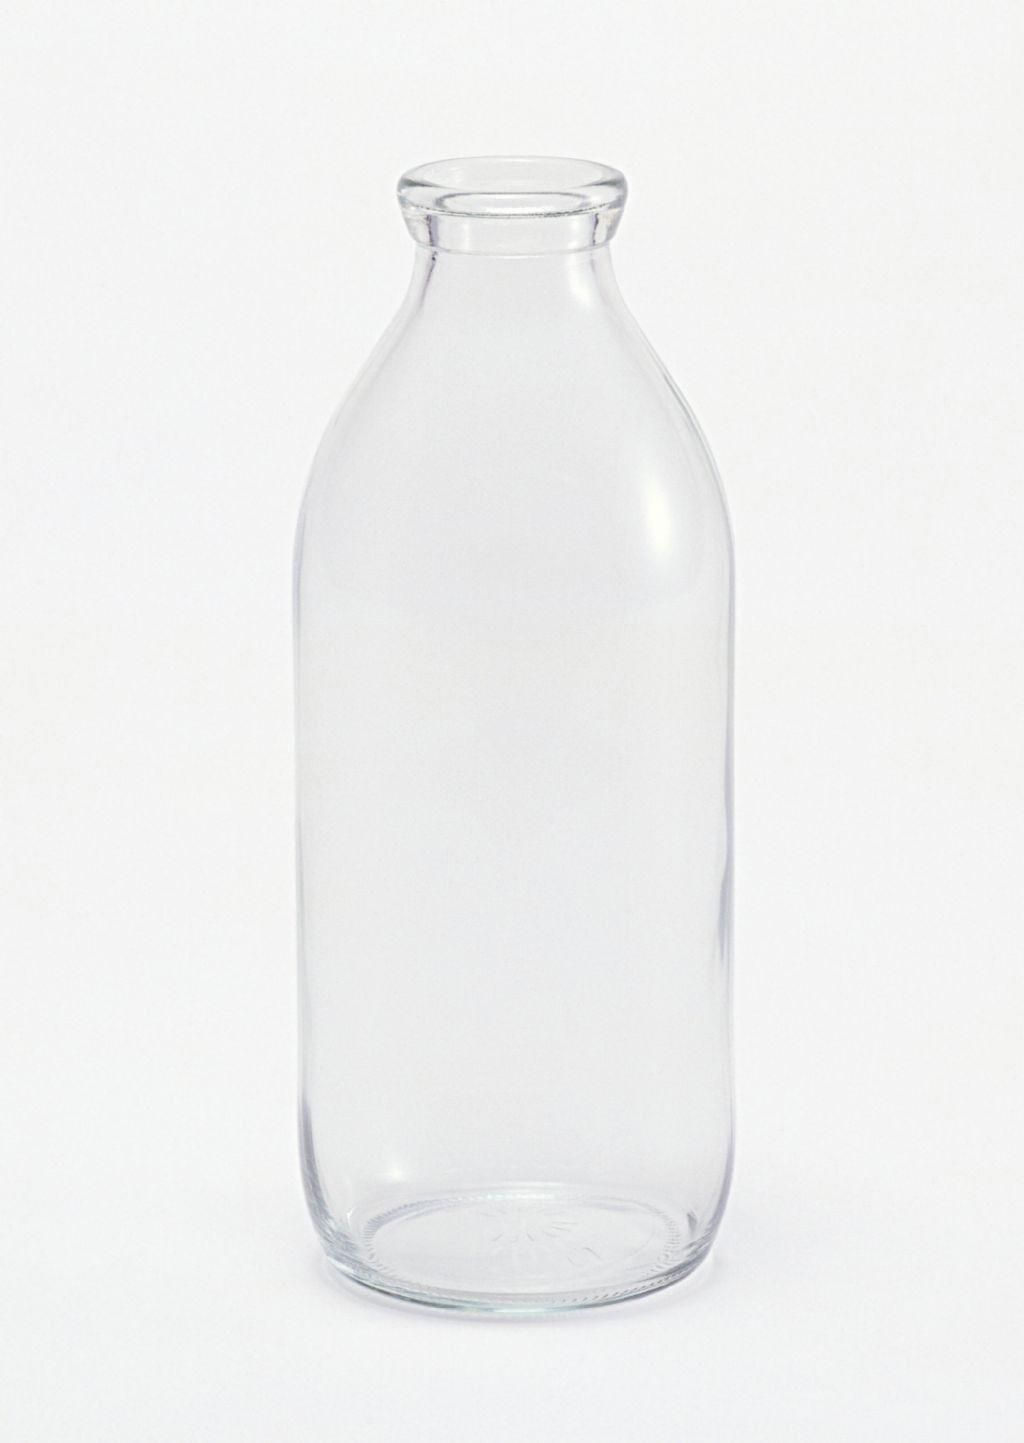 Photoshop快速抠出牛奶瓶和更换背景